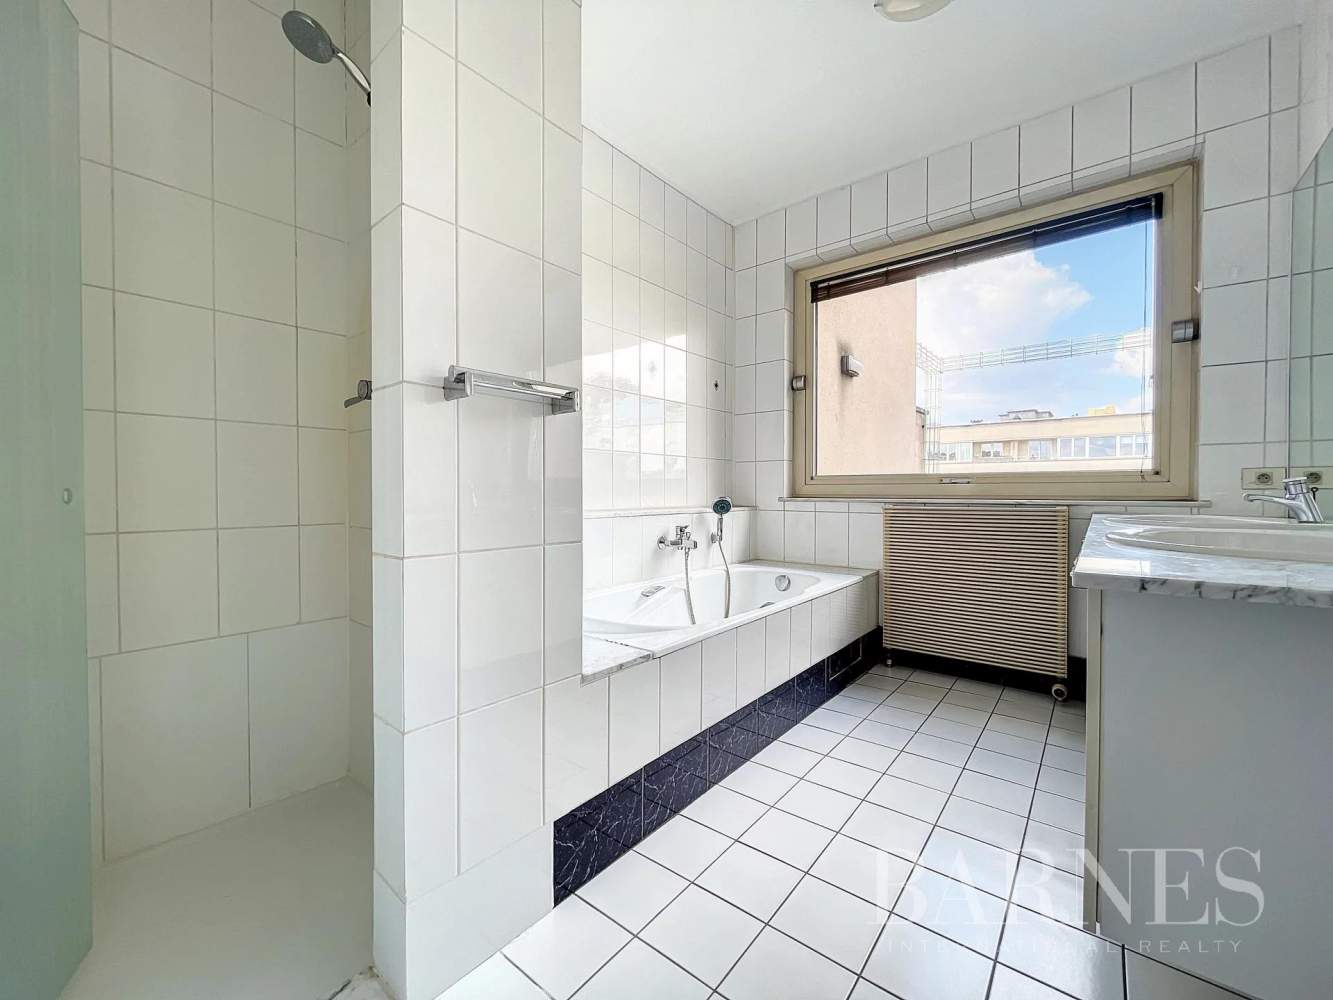 Woluwe-Saint-Lambert  - Appartement 6 Pièces 2 Chambres - picture 11